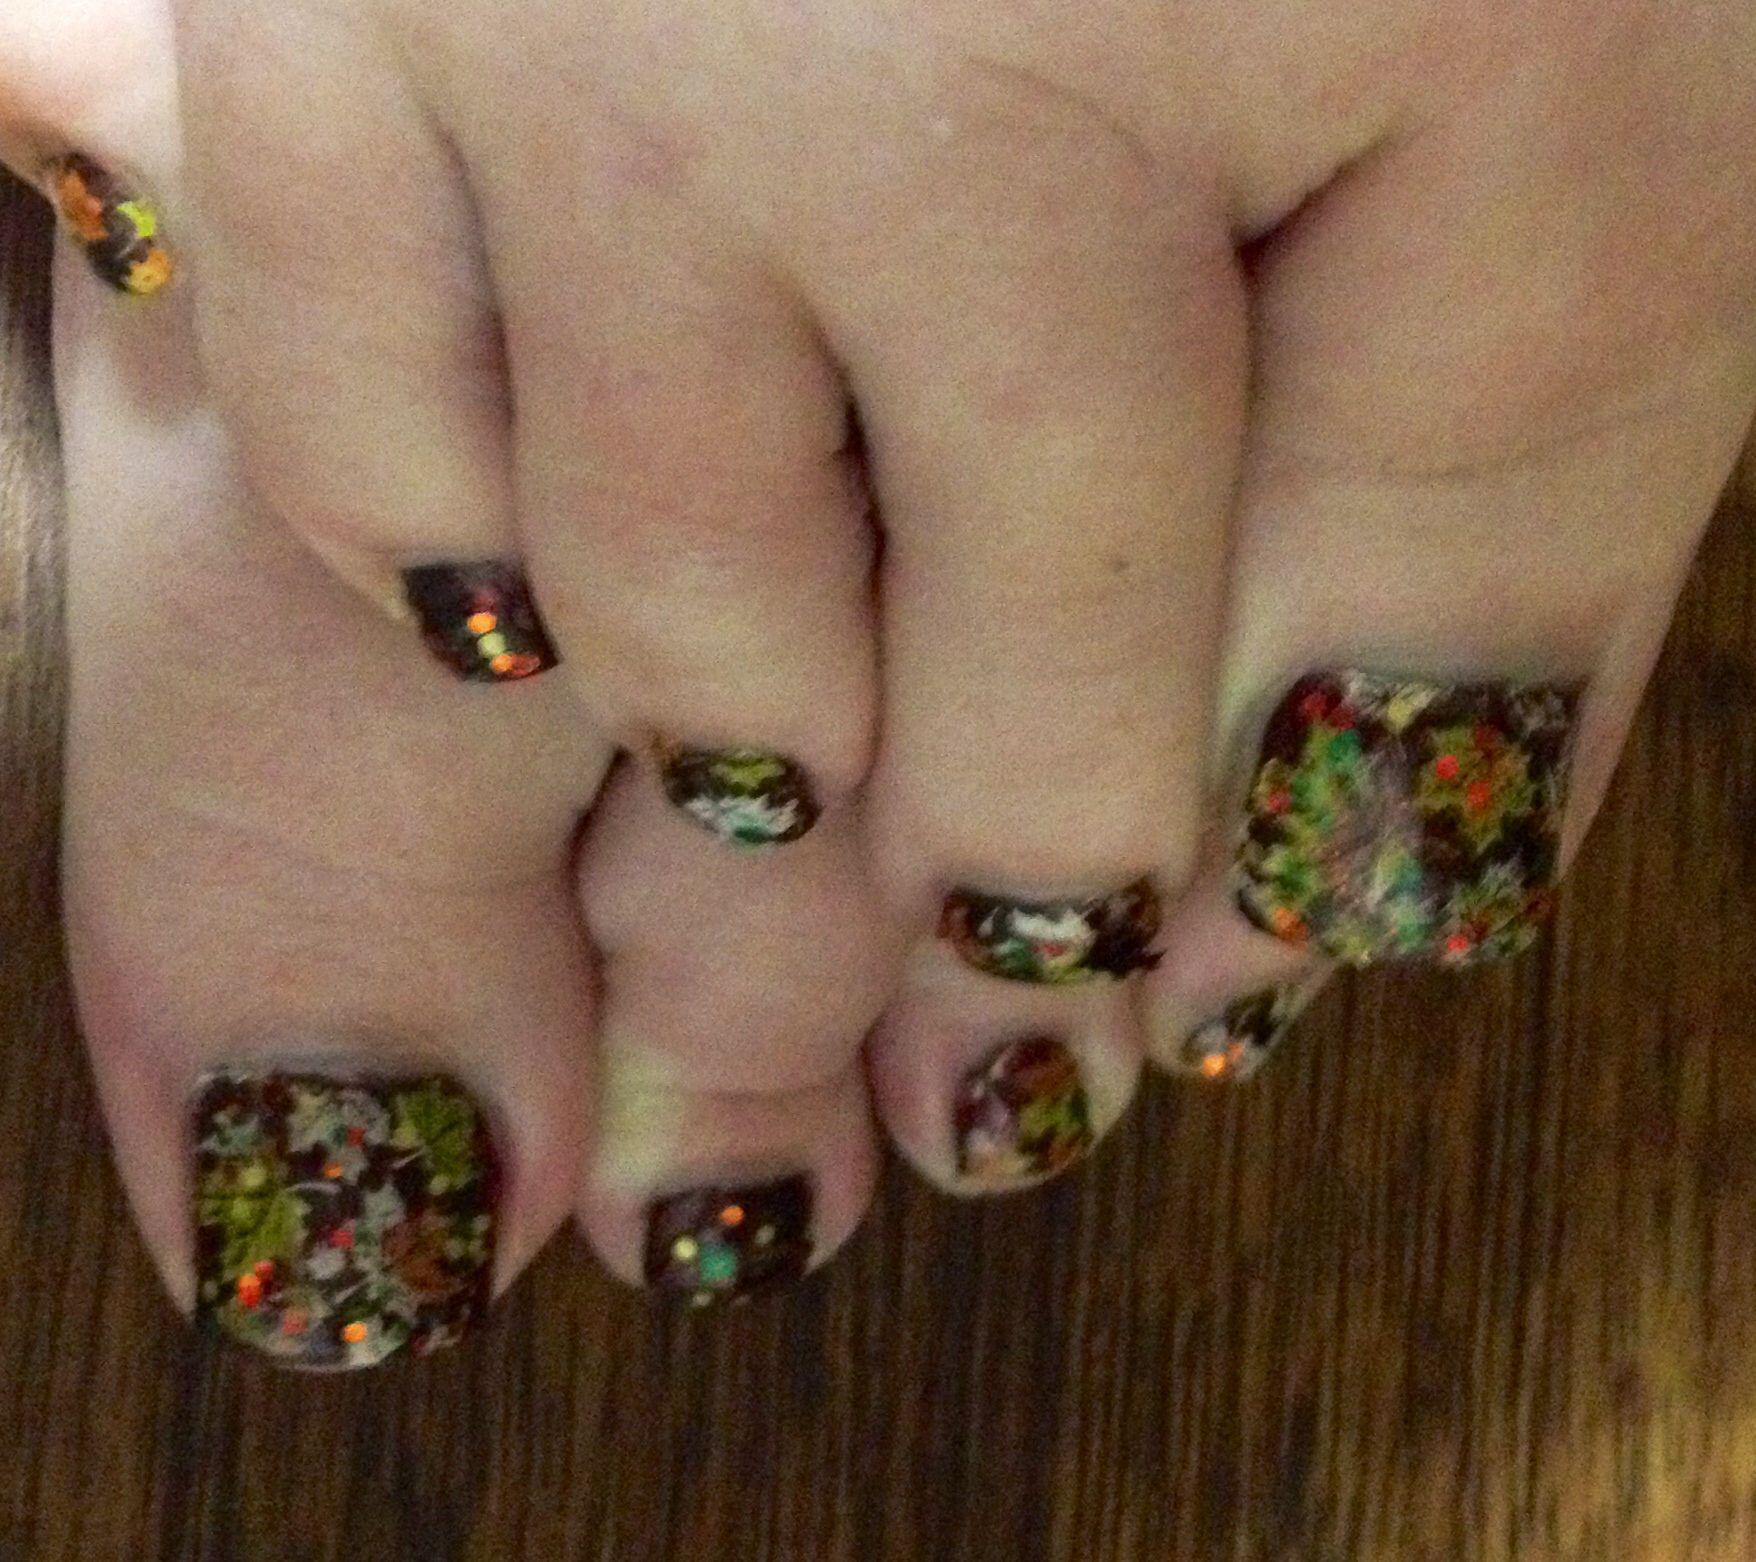 Fall toe nail art | Toetally Awesome | Pinterest | Fall toe nails ...